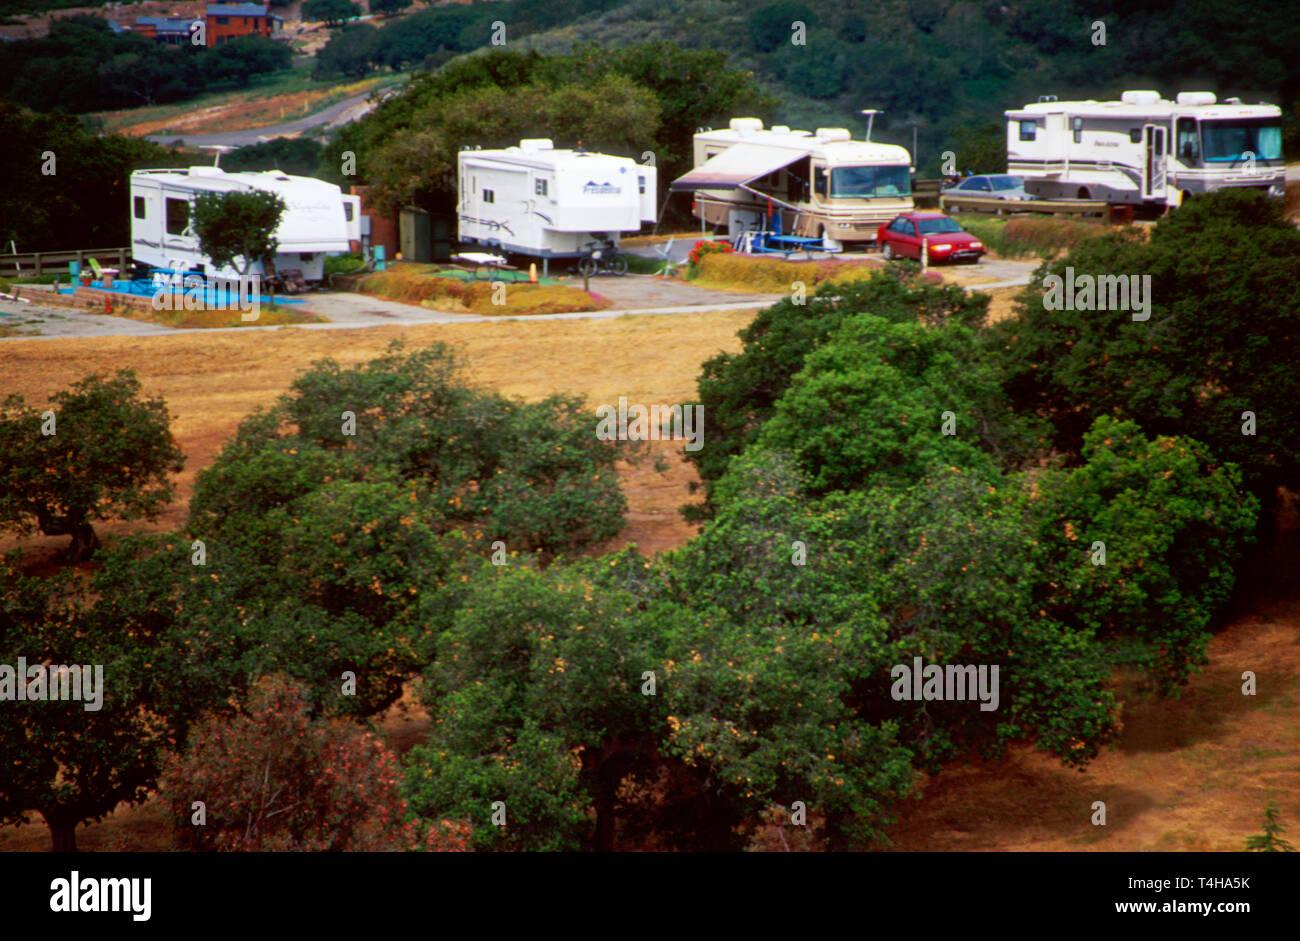 California Monterey County Laguna Seca Recreational Area camping - Stock Image